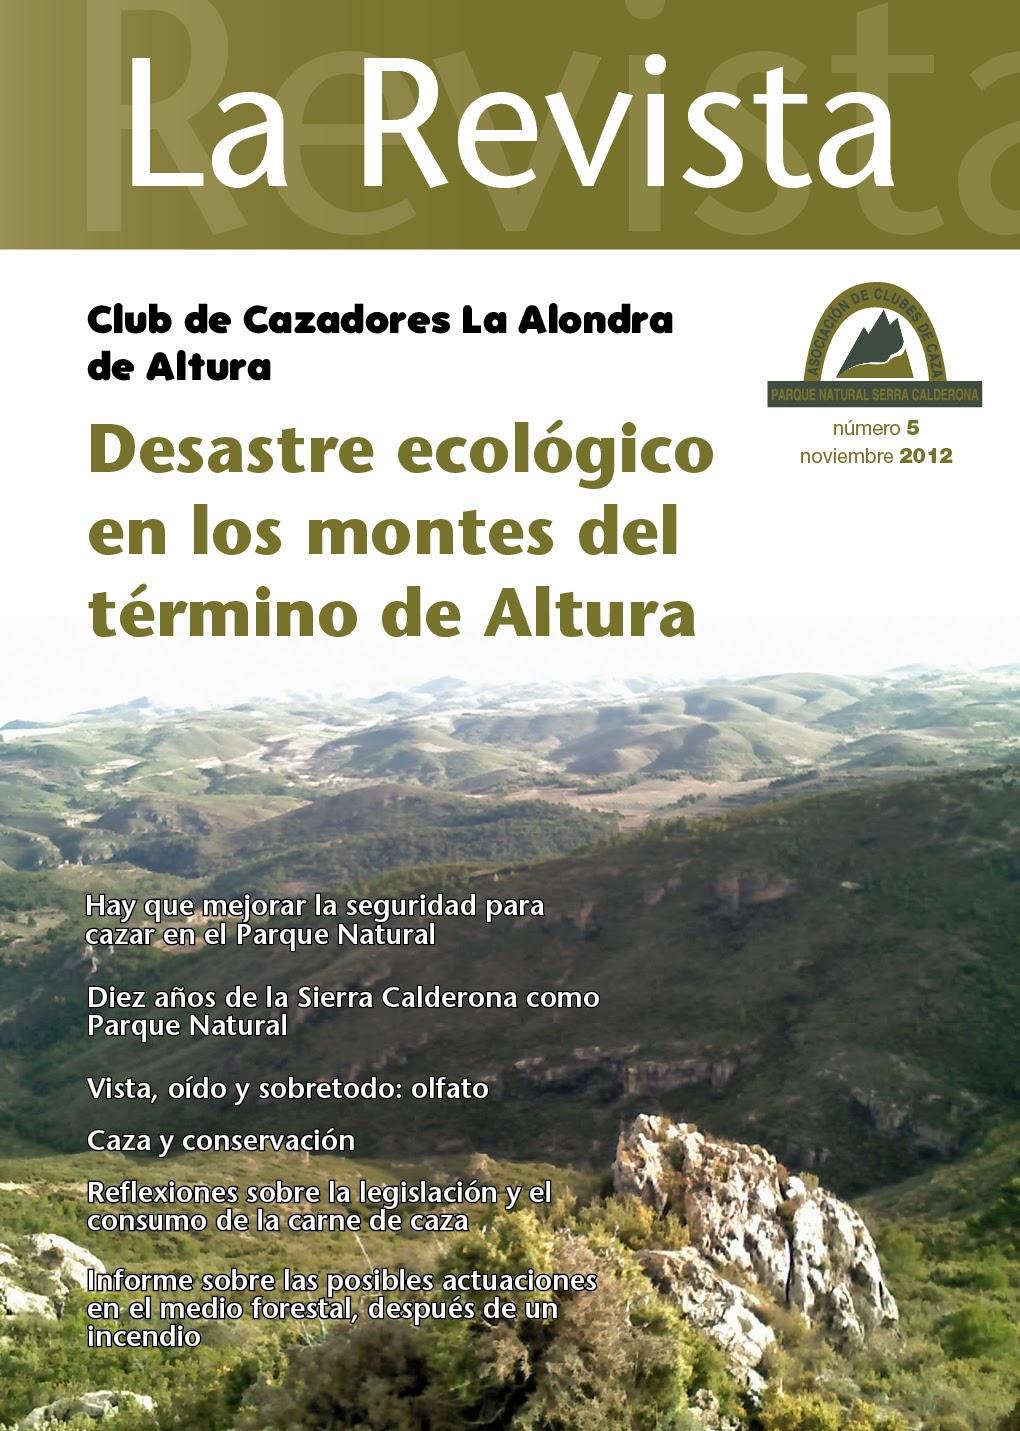 Asociación de Clubes de Caza de la Sierra Calderona